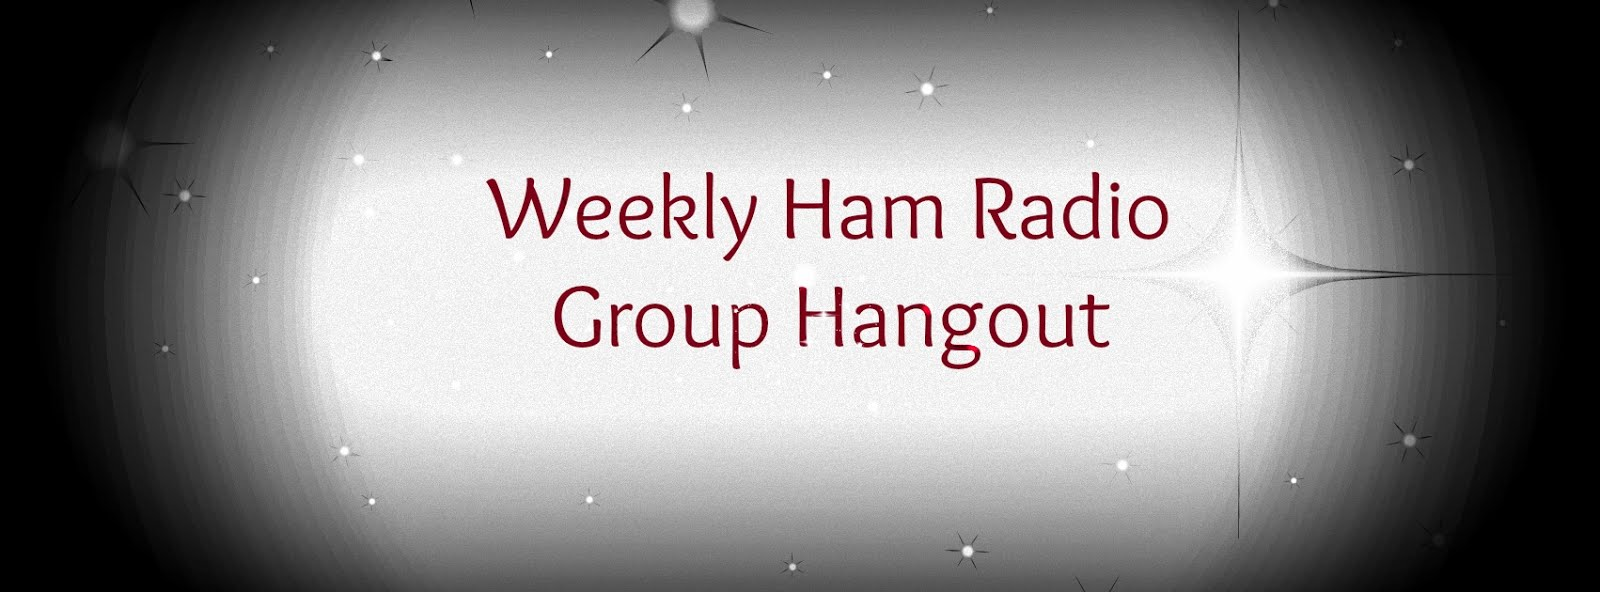 Weekly Ham Radio Hangout